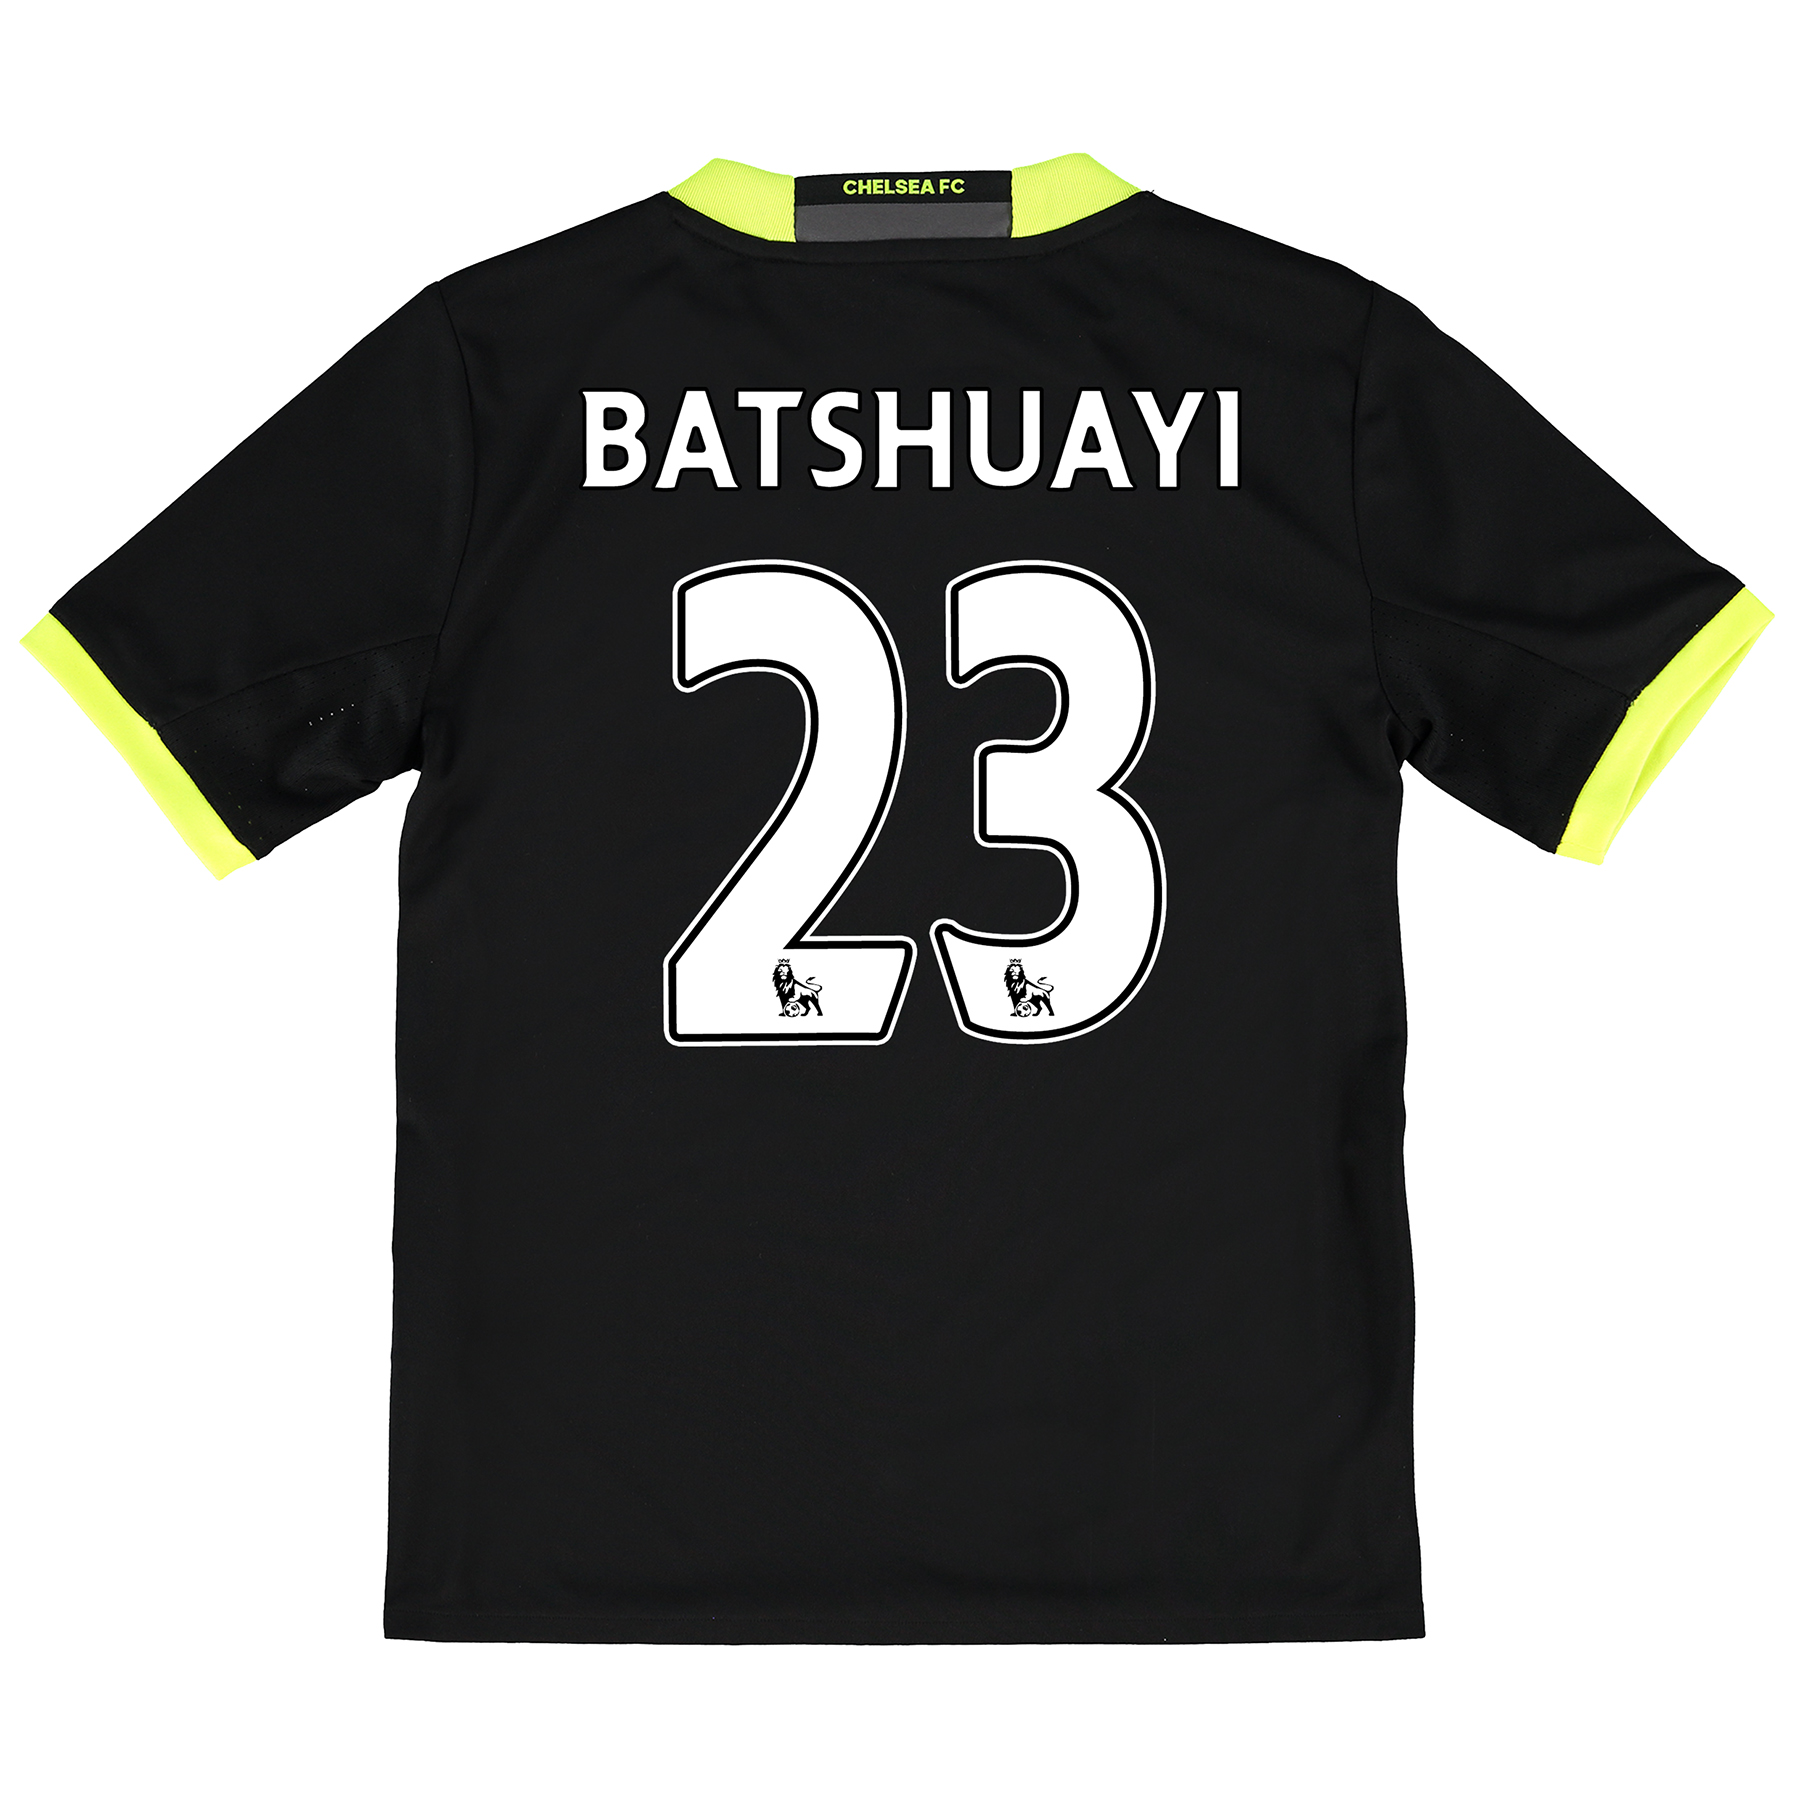 Chelsea Away Shirt 16-17 - Kids with Batshuayi 23 printing